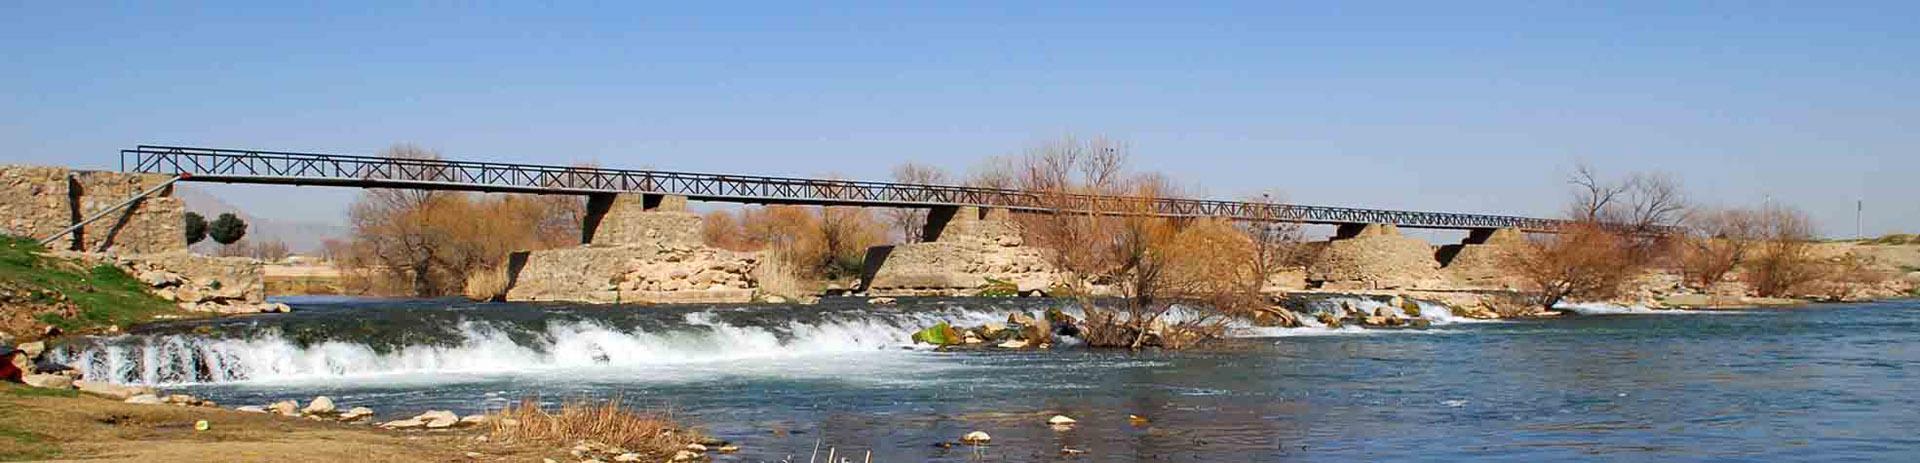 Sasanian Bridge (Khosrow)-Kermanshah Province